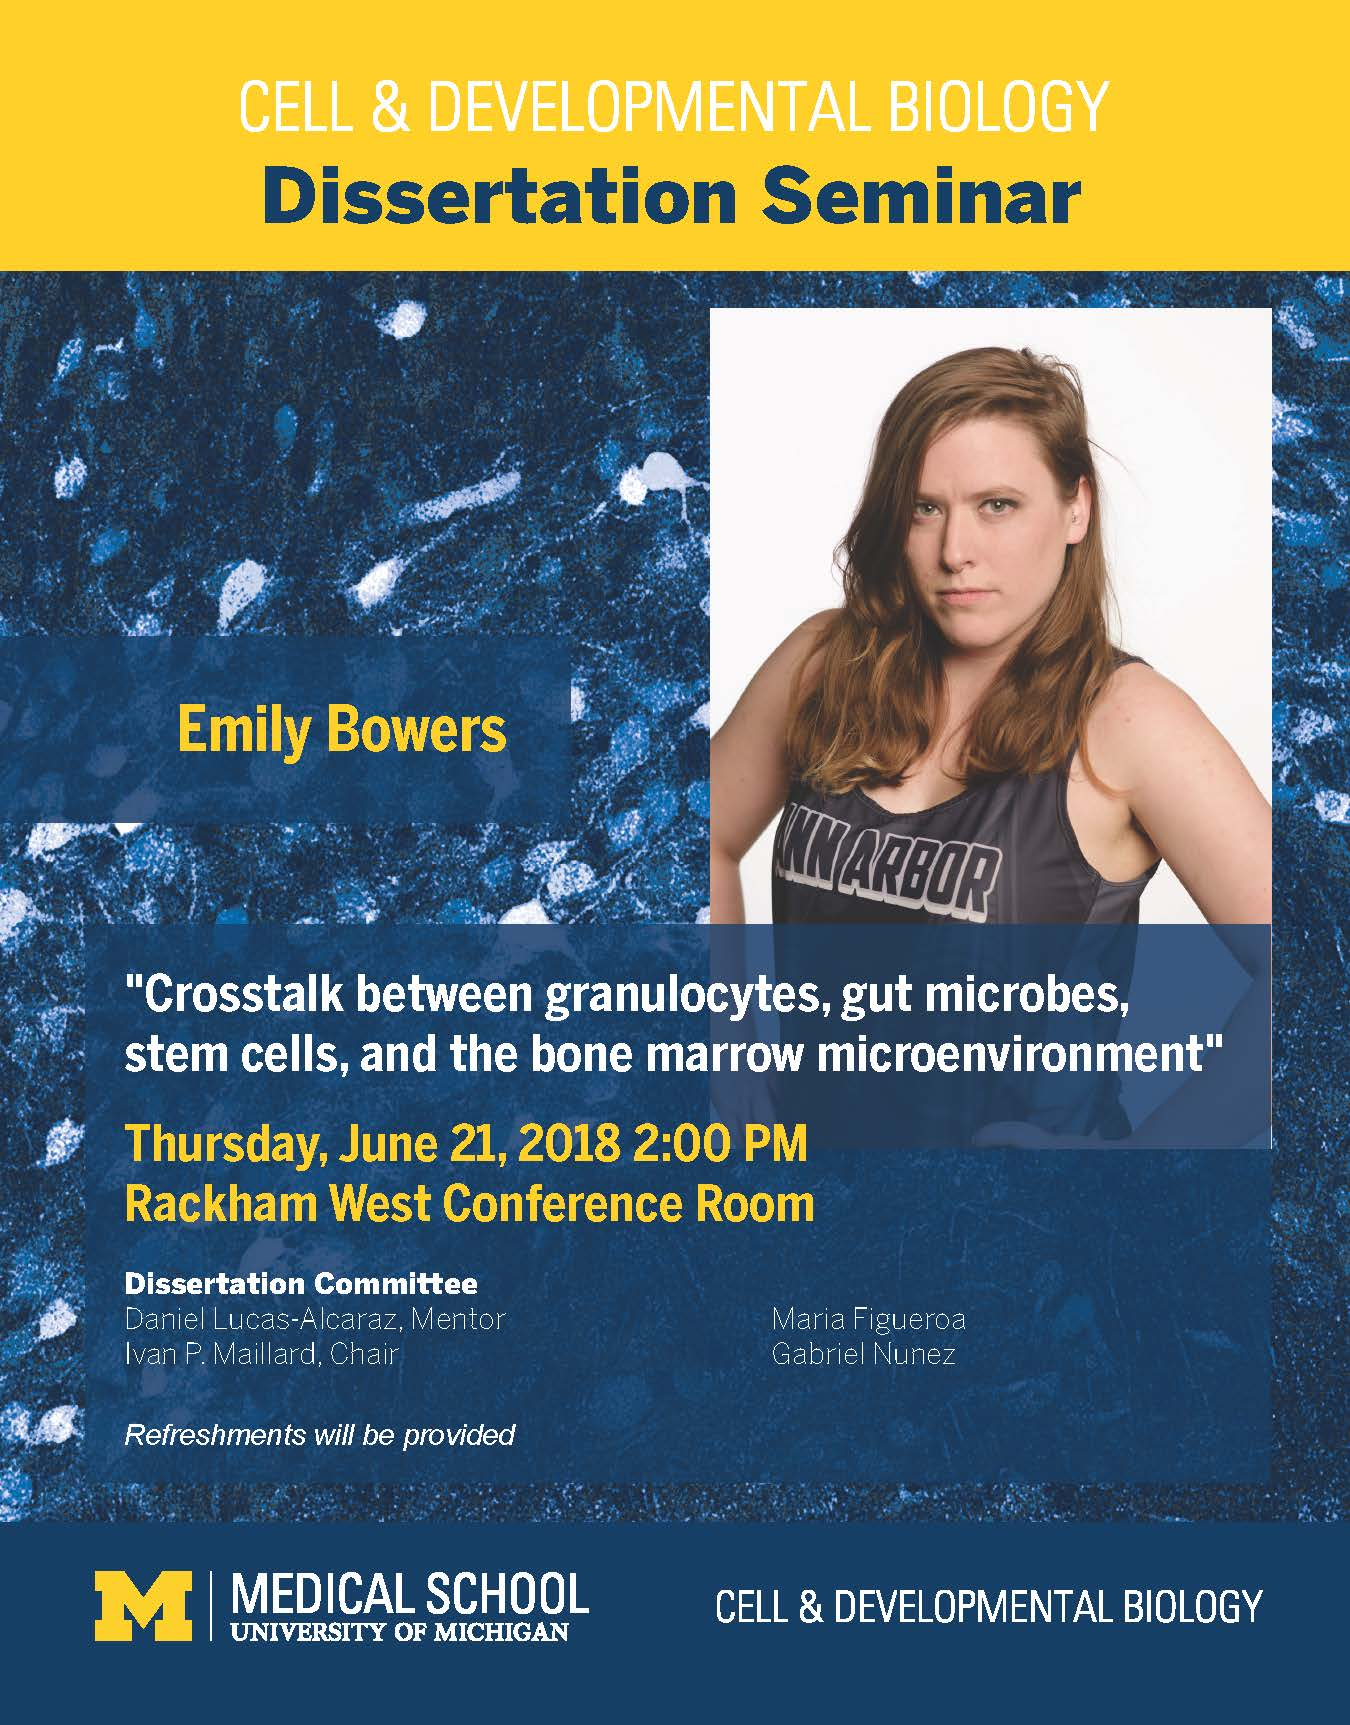 Emily Bowers Dissertation